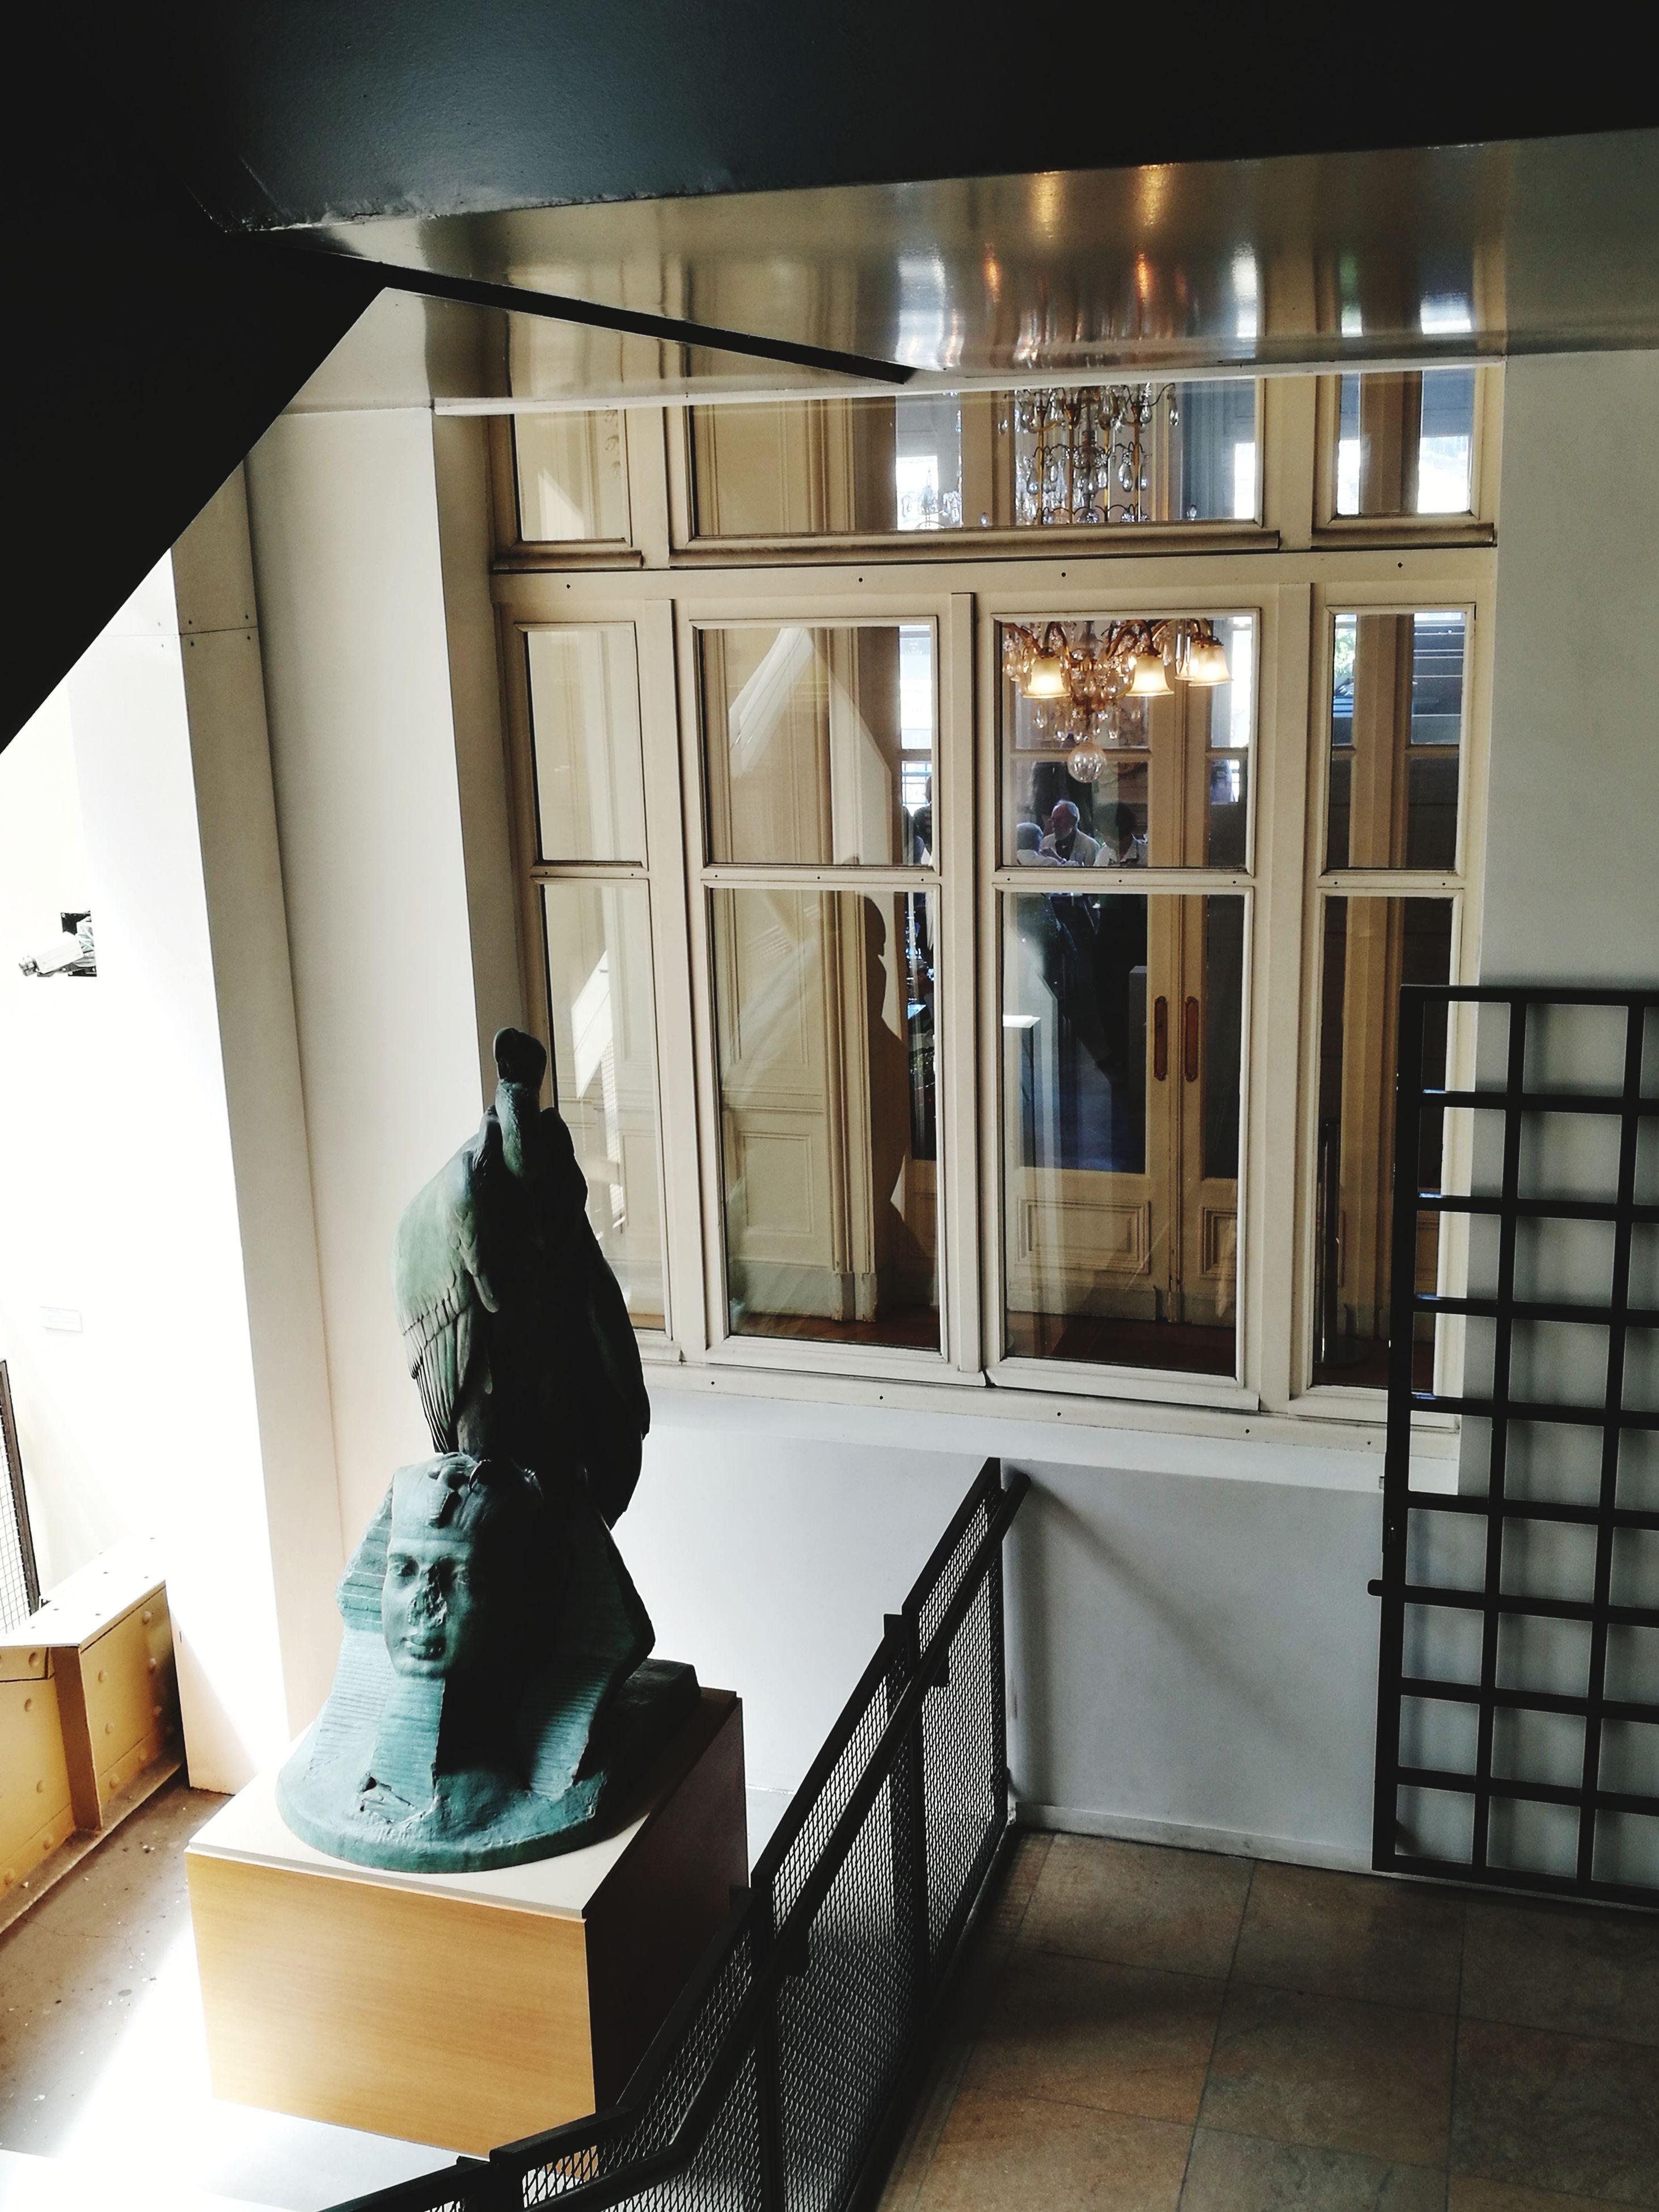 indoors, window, statue, illuminated, night, no people